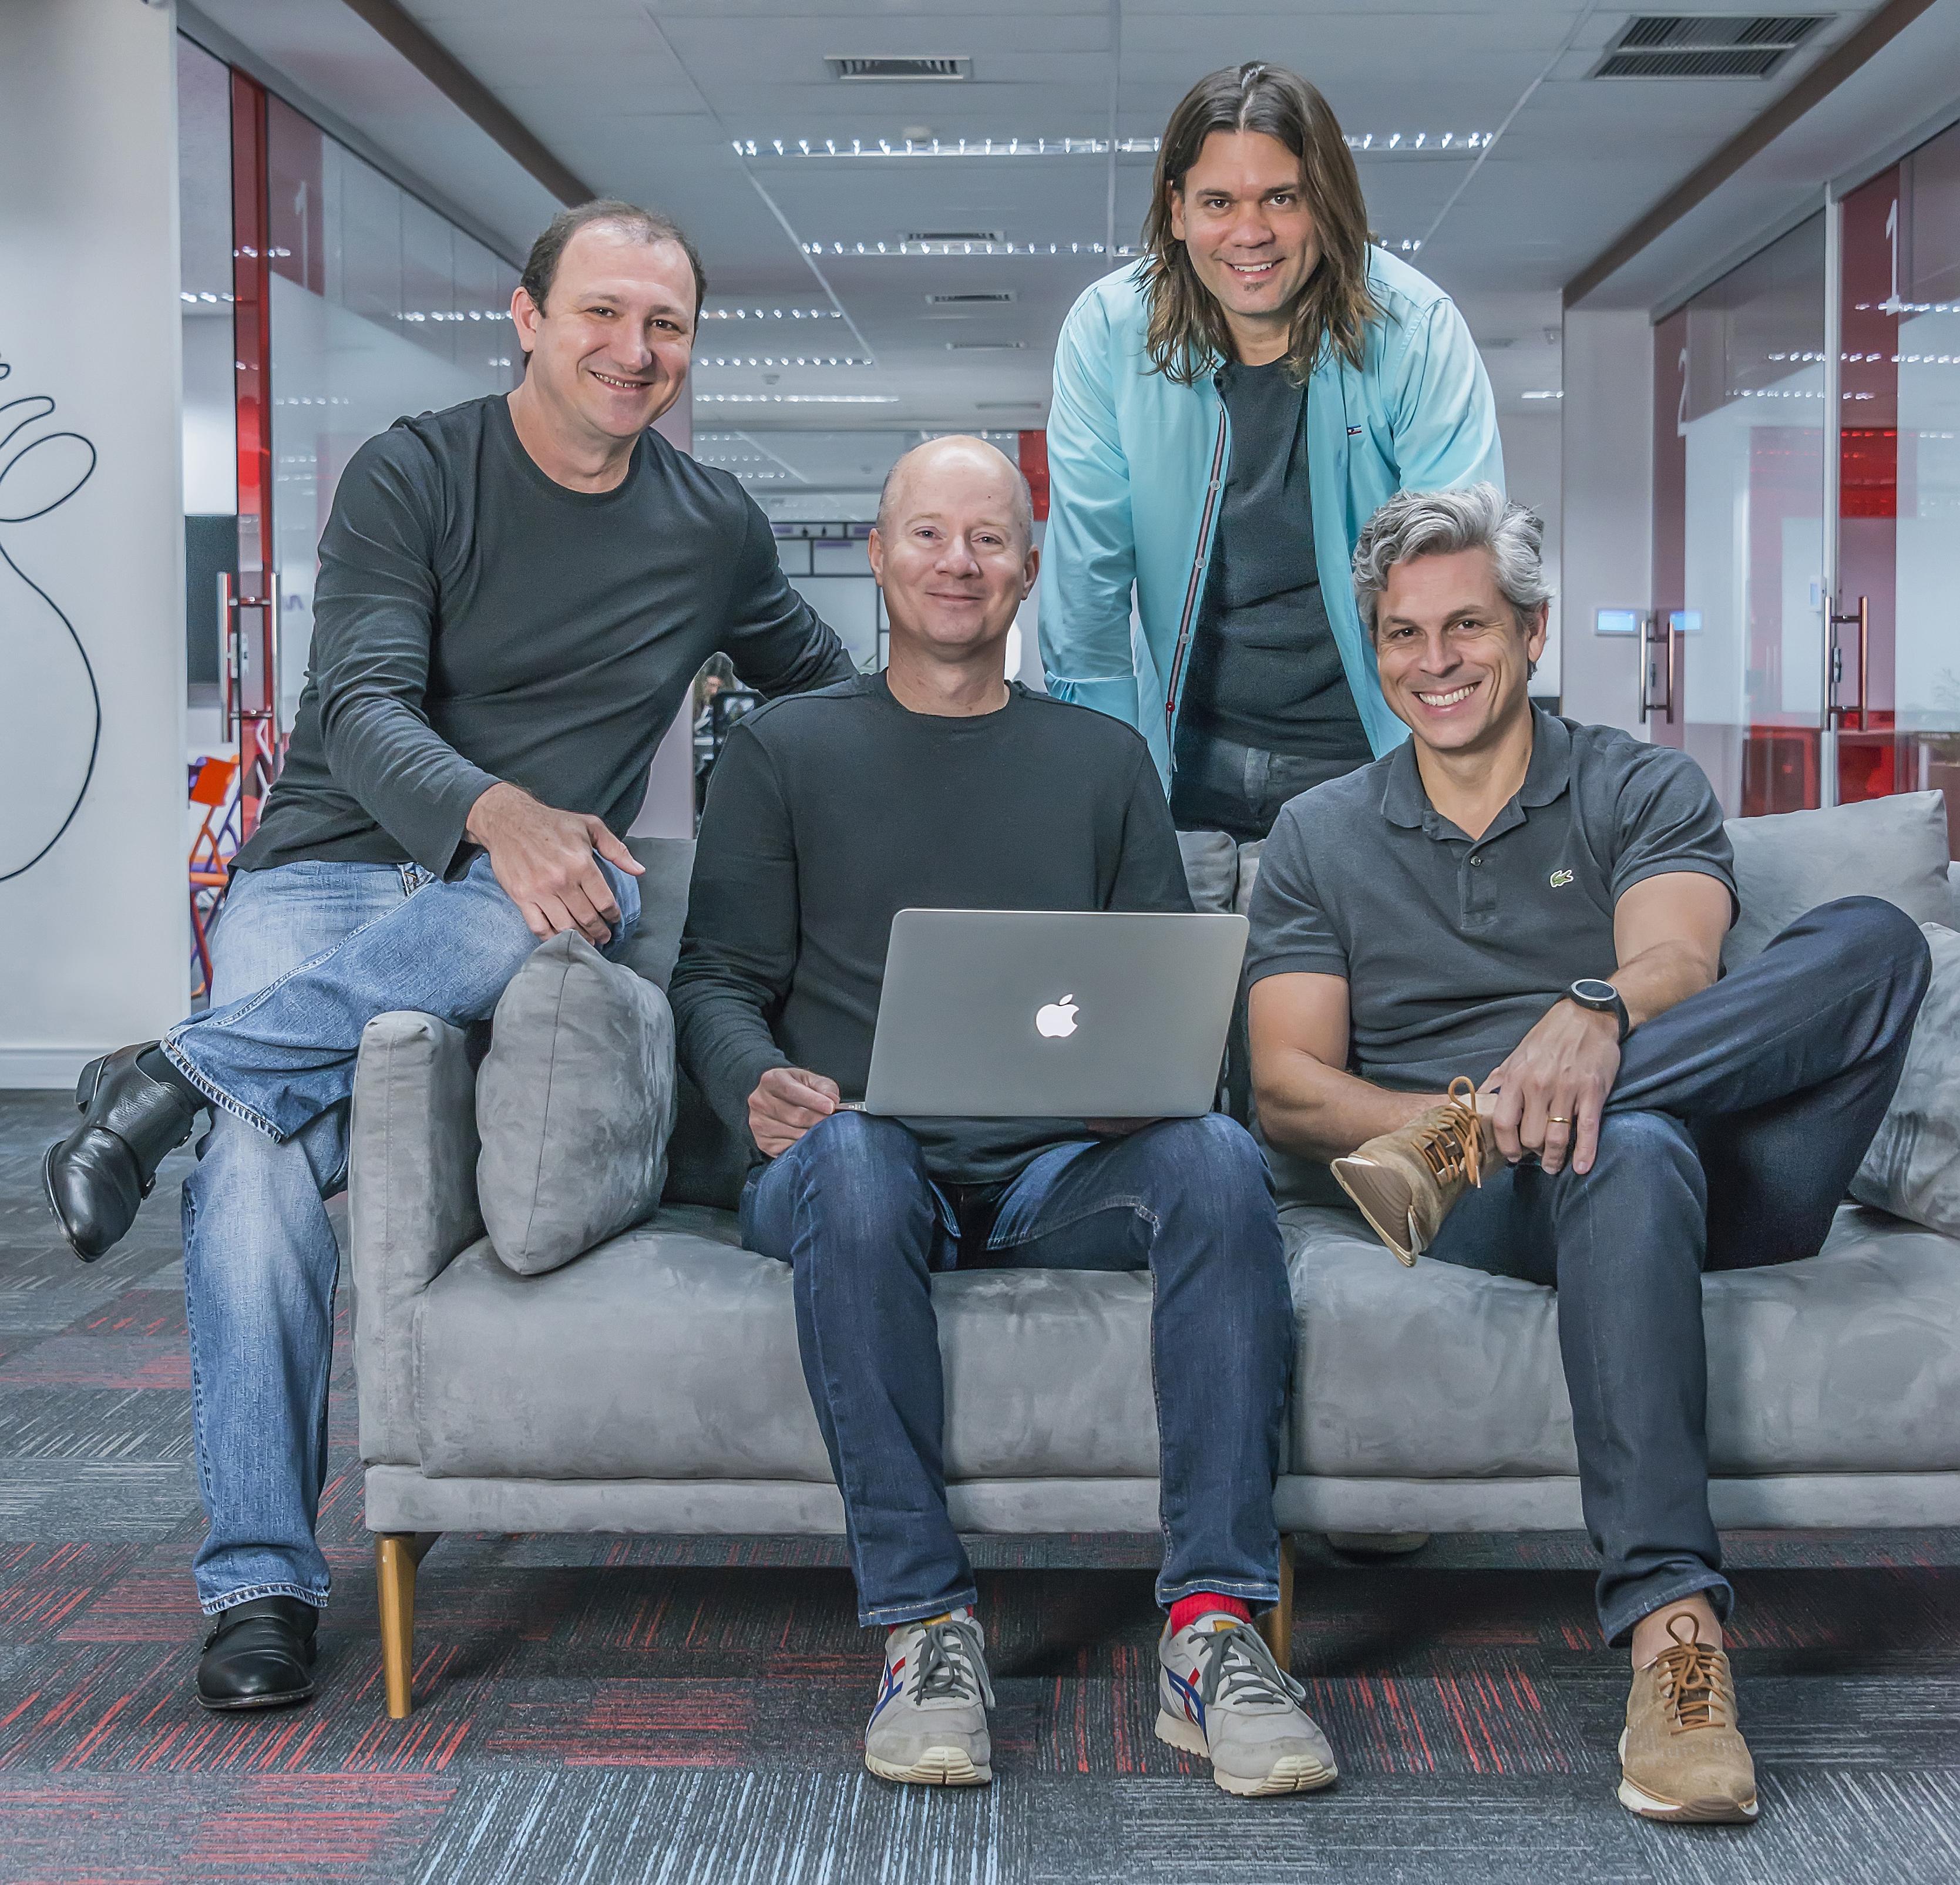 Cesar Gon, Thelton McMillian, Leonardo Mattiazzi and Bruno Guicardi together at a CI&T office